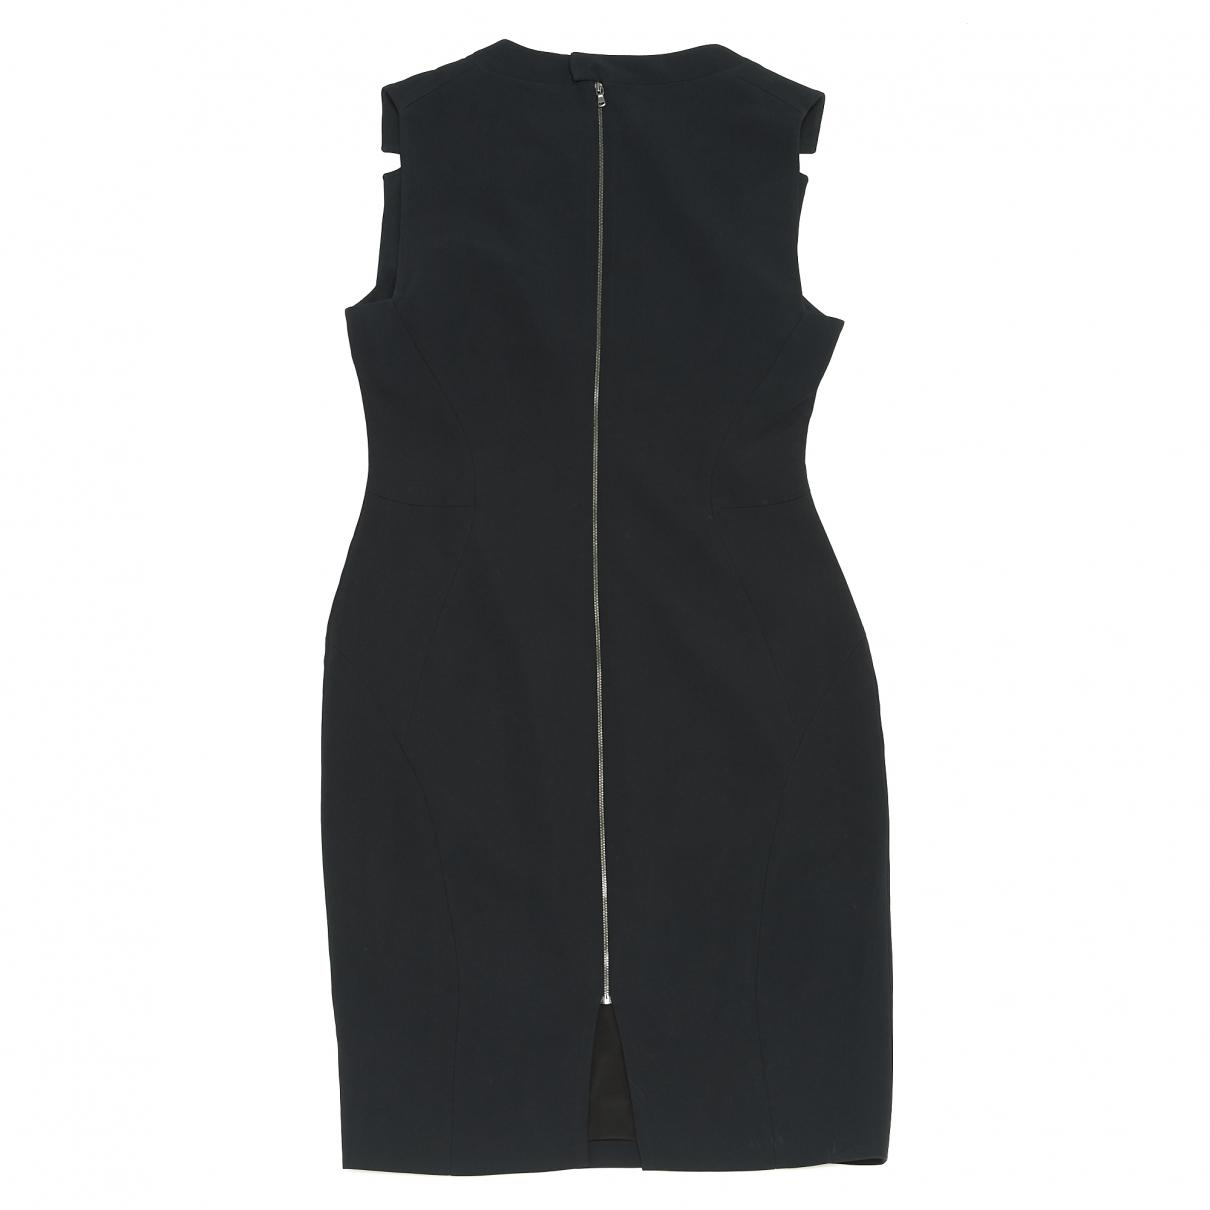 Antonio Berardi Black Synthetic Dress in Black - Lyst 7972c54ac